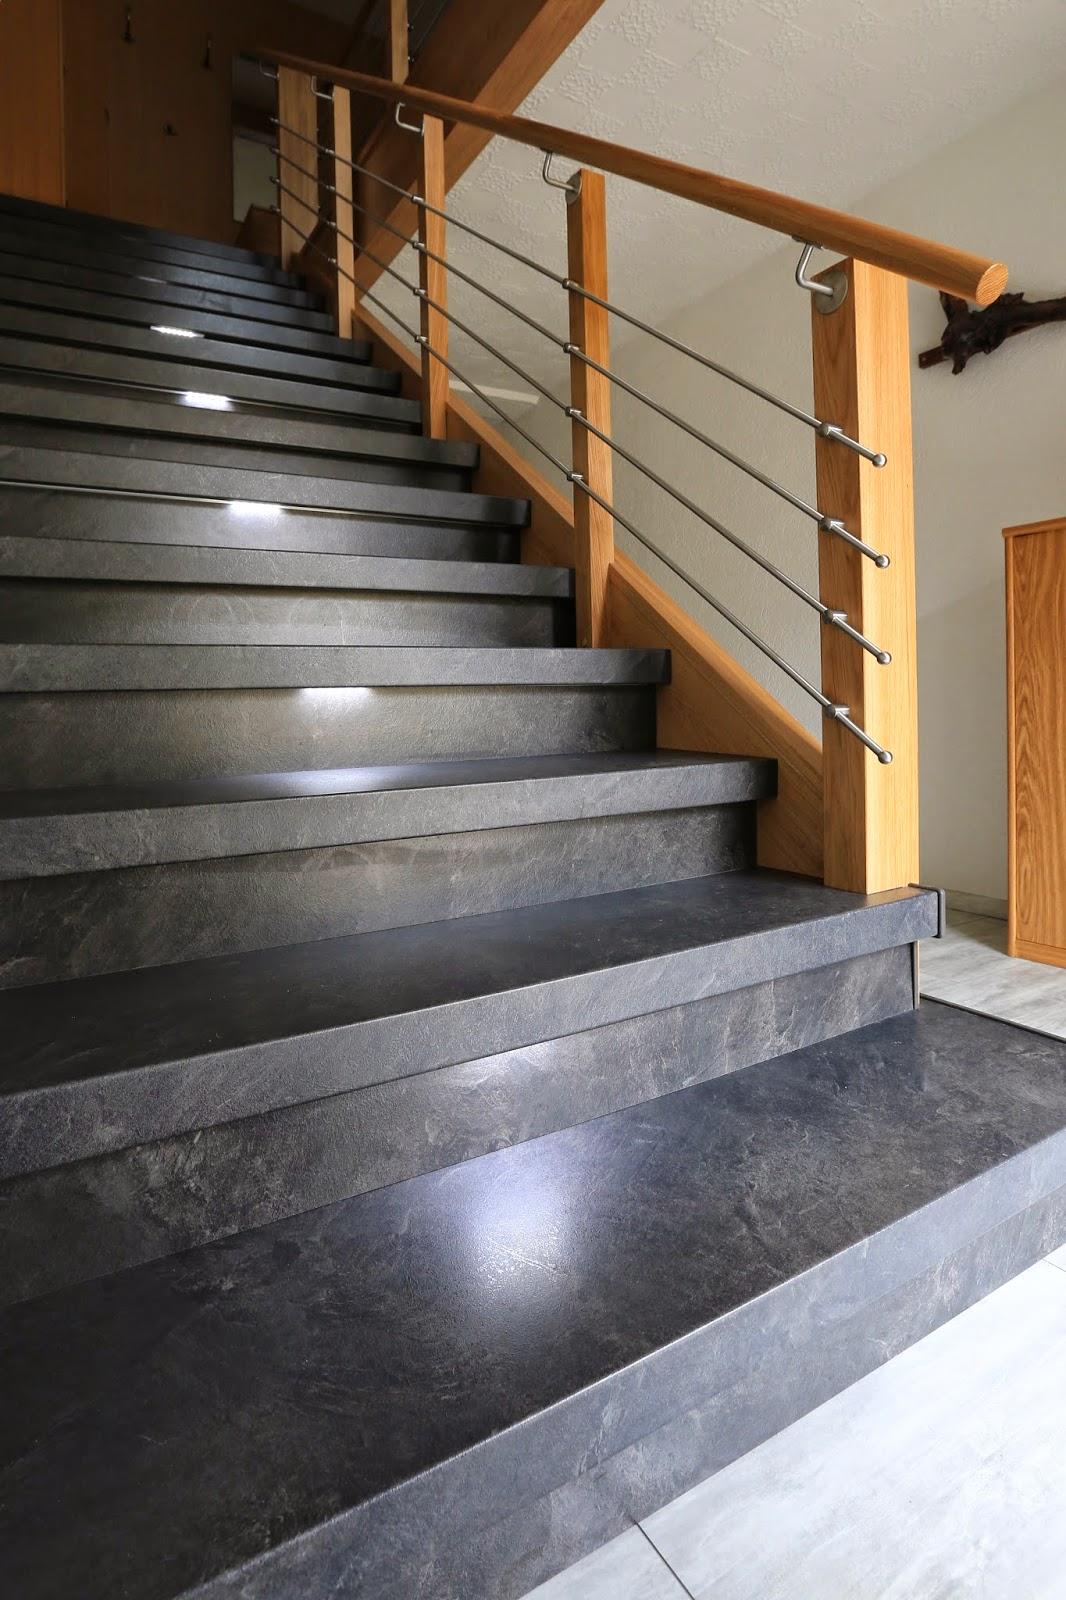 Treppengeländer - Holzsäulen in Kombination mit Edelstahl-Traversen